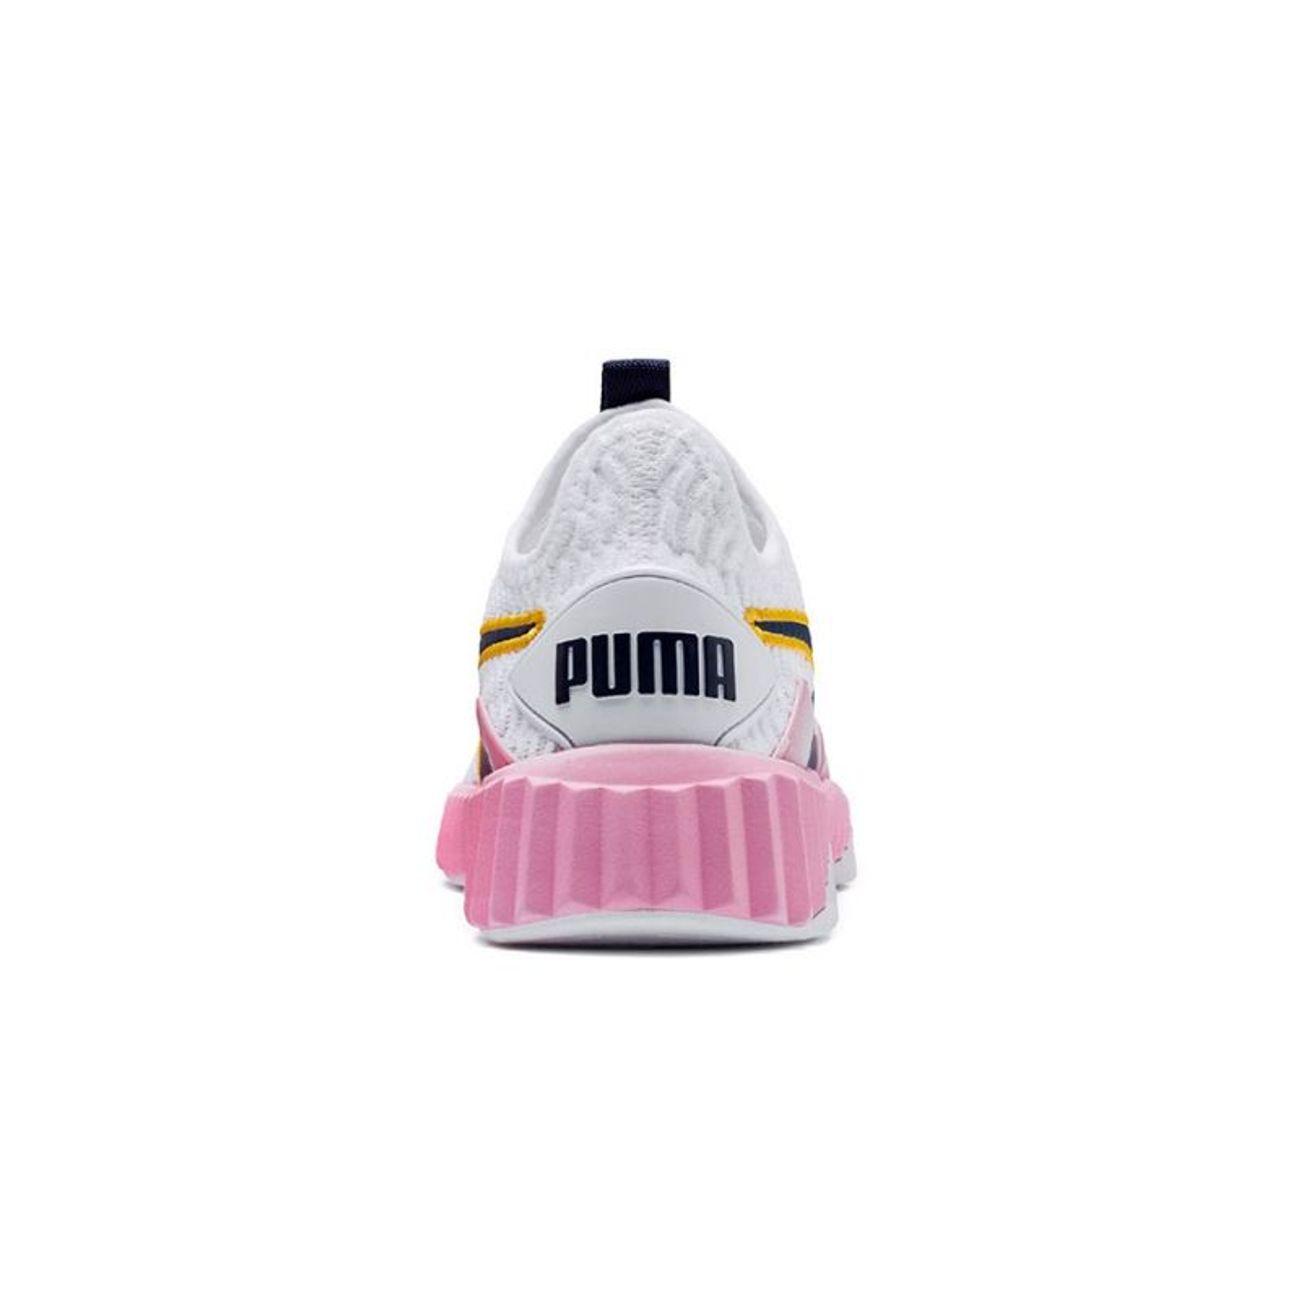 Adulte Femme Defy Blanc Puma Padel 19094915 Rose m8n0ONvw